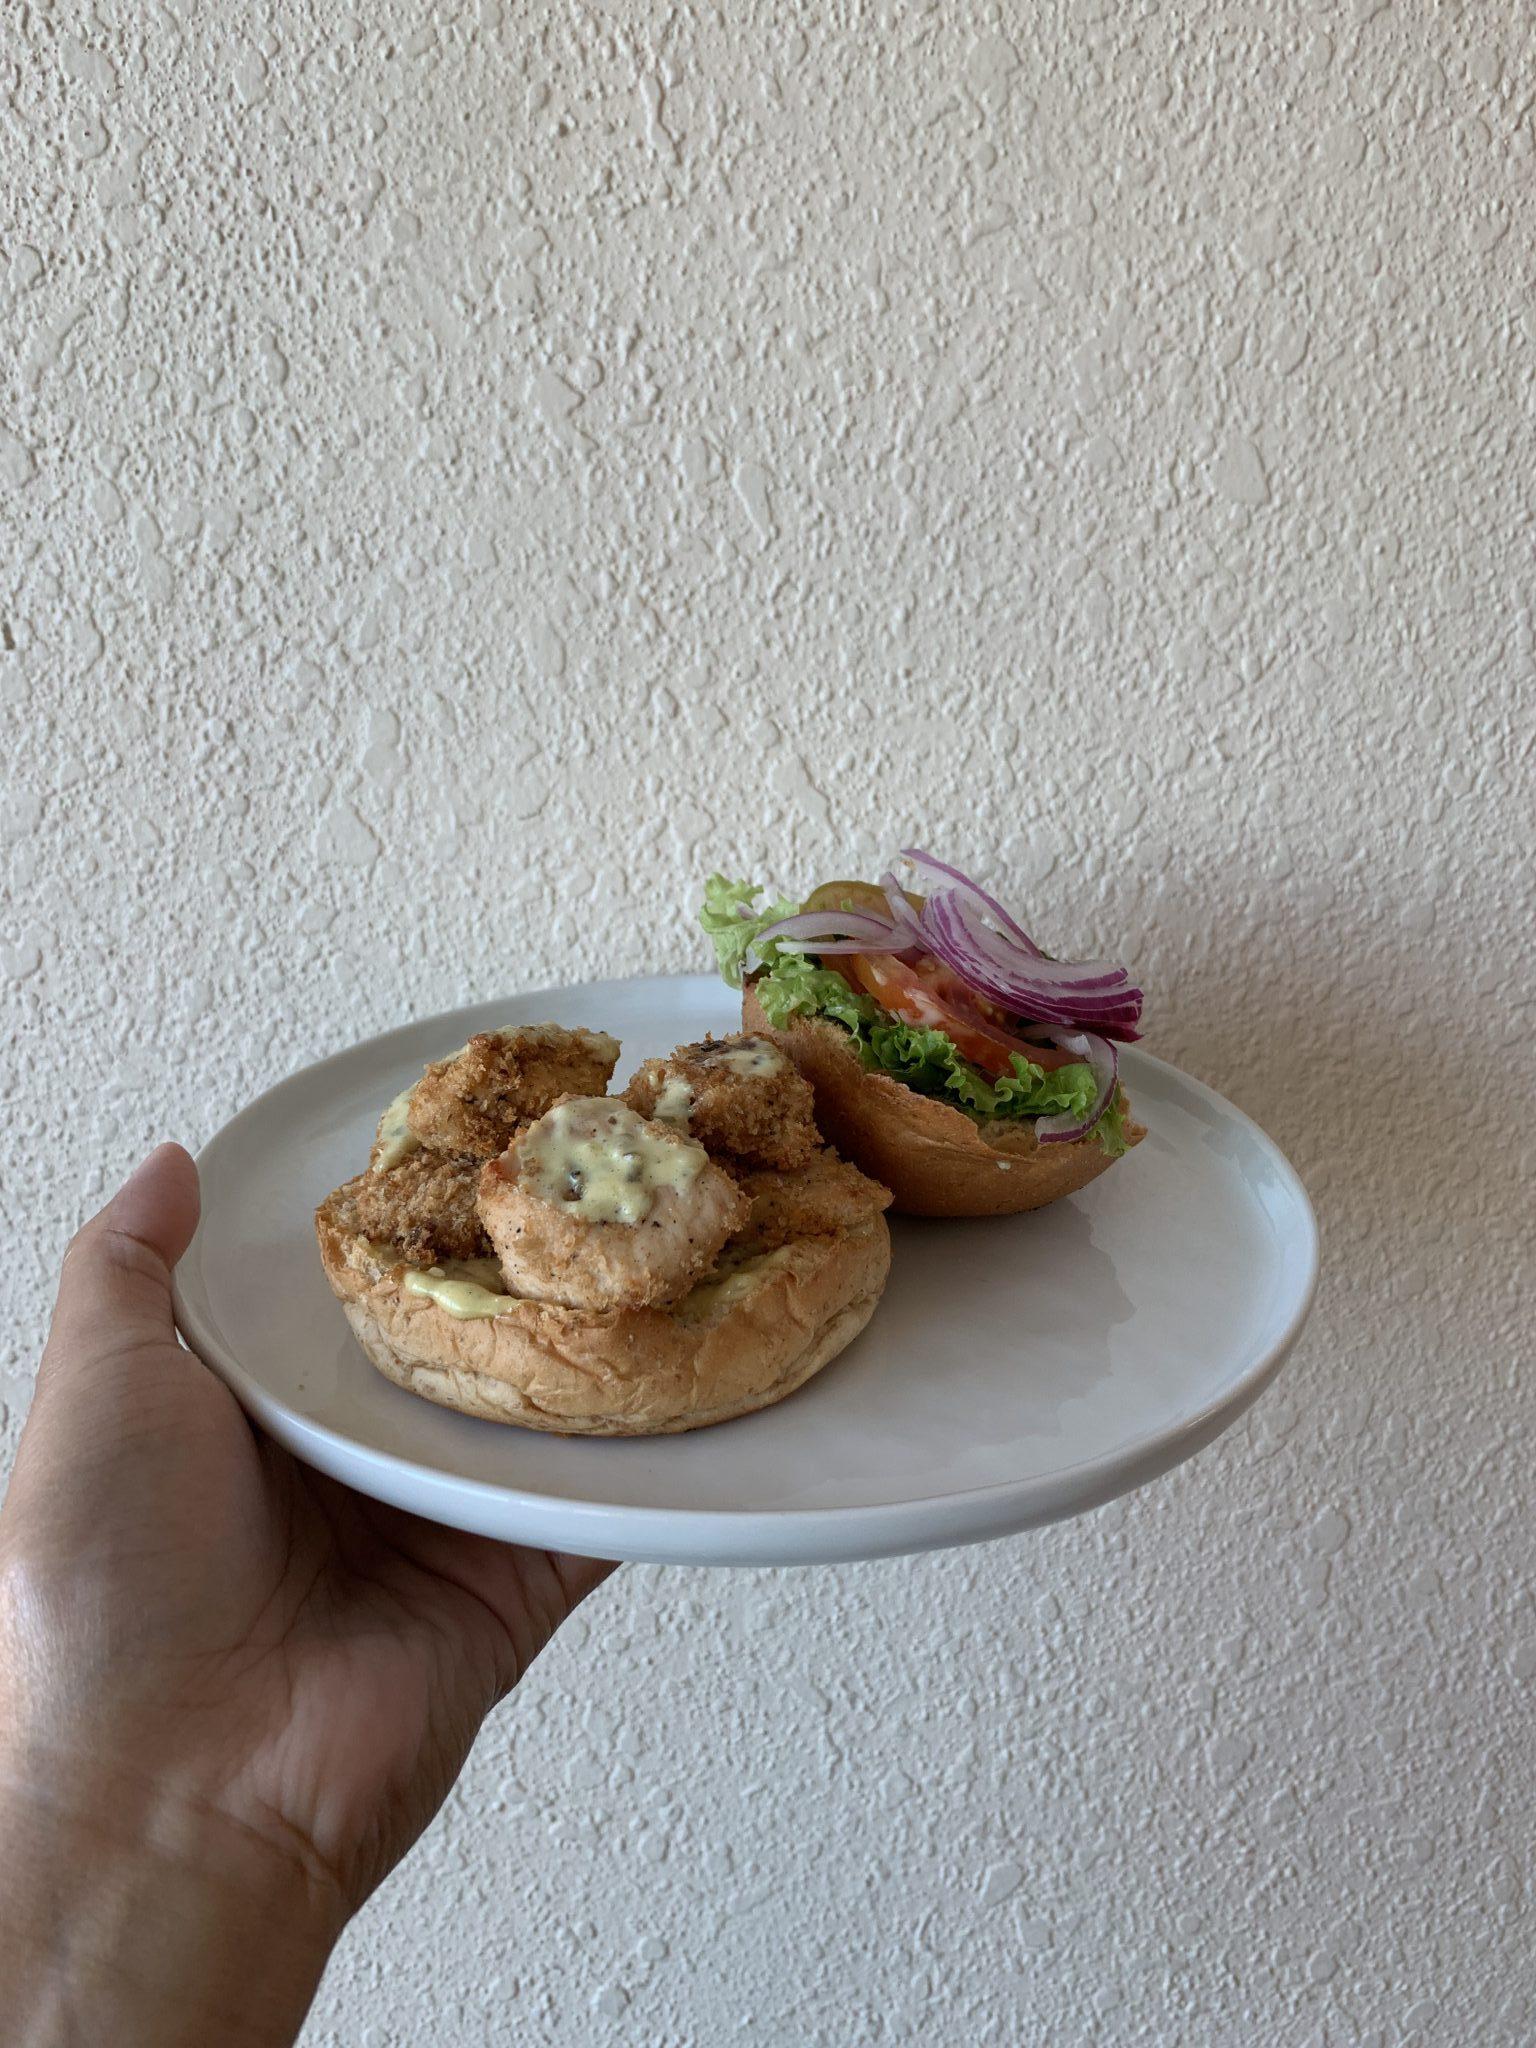 Pickle Healthy Delivery's Cajun chicken sandwich